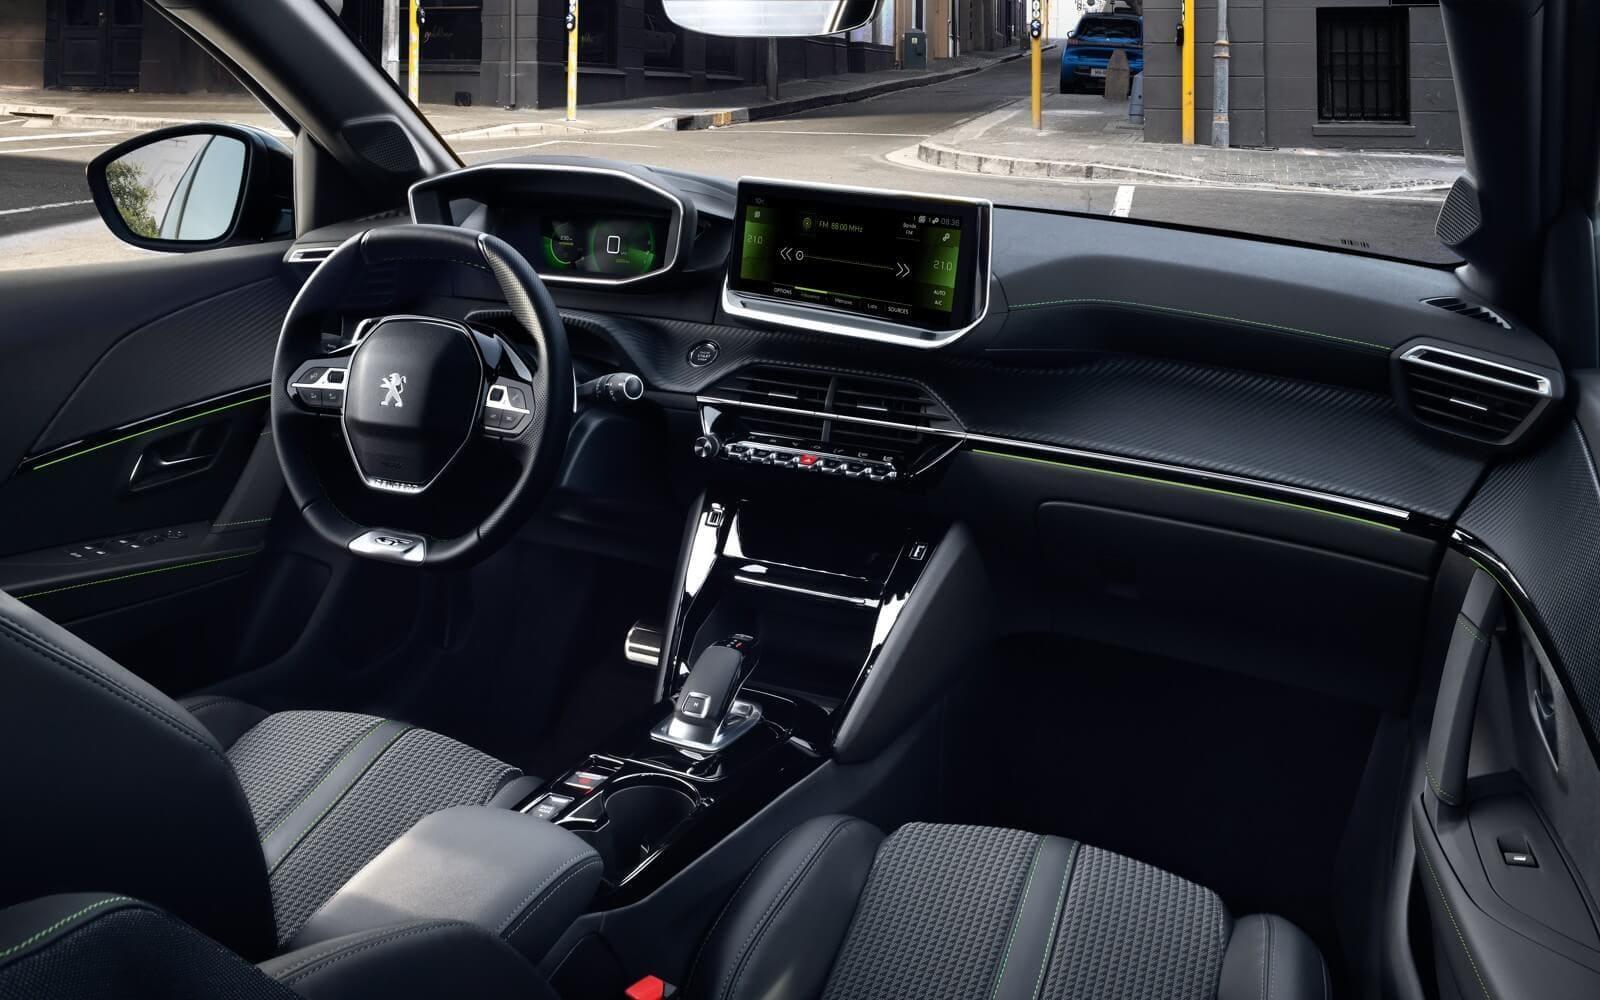 Peugeot 208 interiér, najvyššia výbava